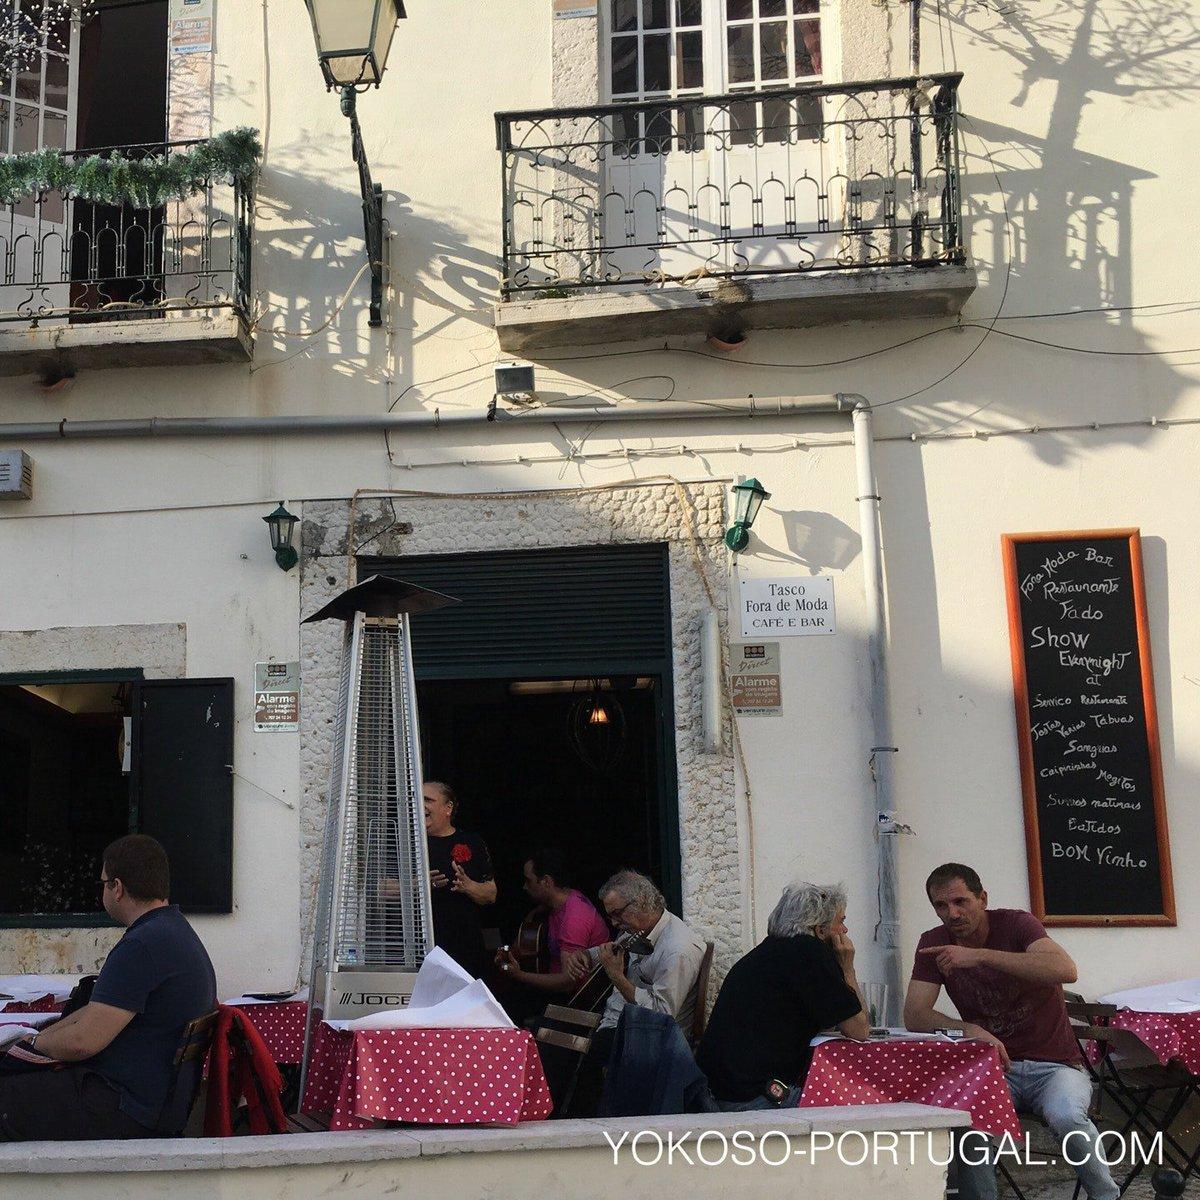 test ツイッターメディア - リスボンのアルファマ地区、エステヴァオン教会前にあるレストラン。夕方からはファドが楽しめます。テーブルチャージなし、飲み物だけでもOKです。 (@ Fora de Moda in Lisboa) https://t.co/NYBCj46U2c https://t.co/3PURmvAVYd